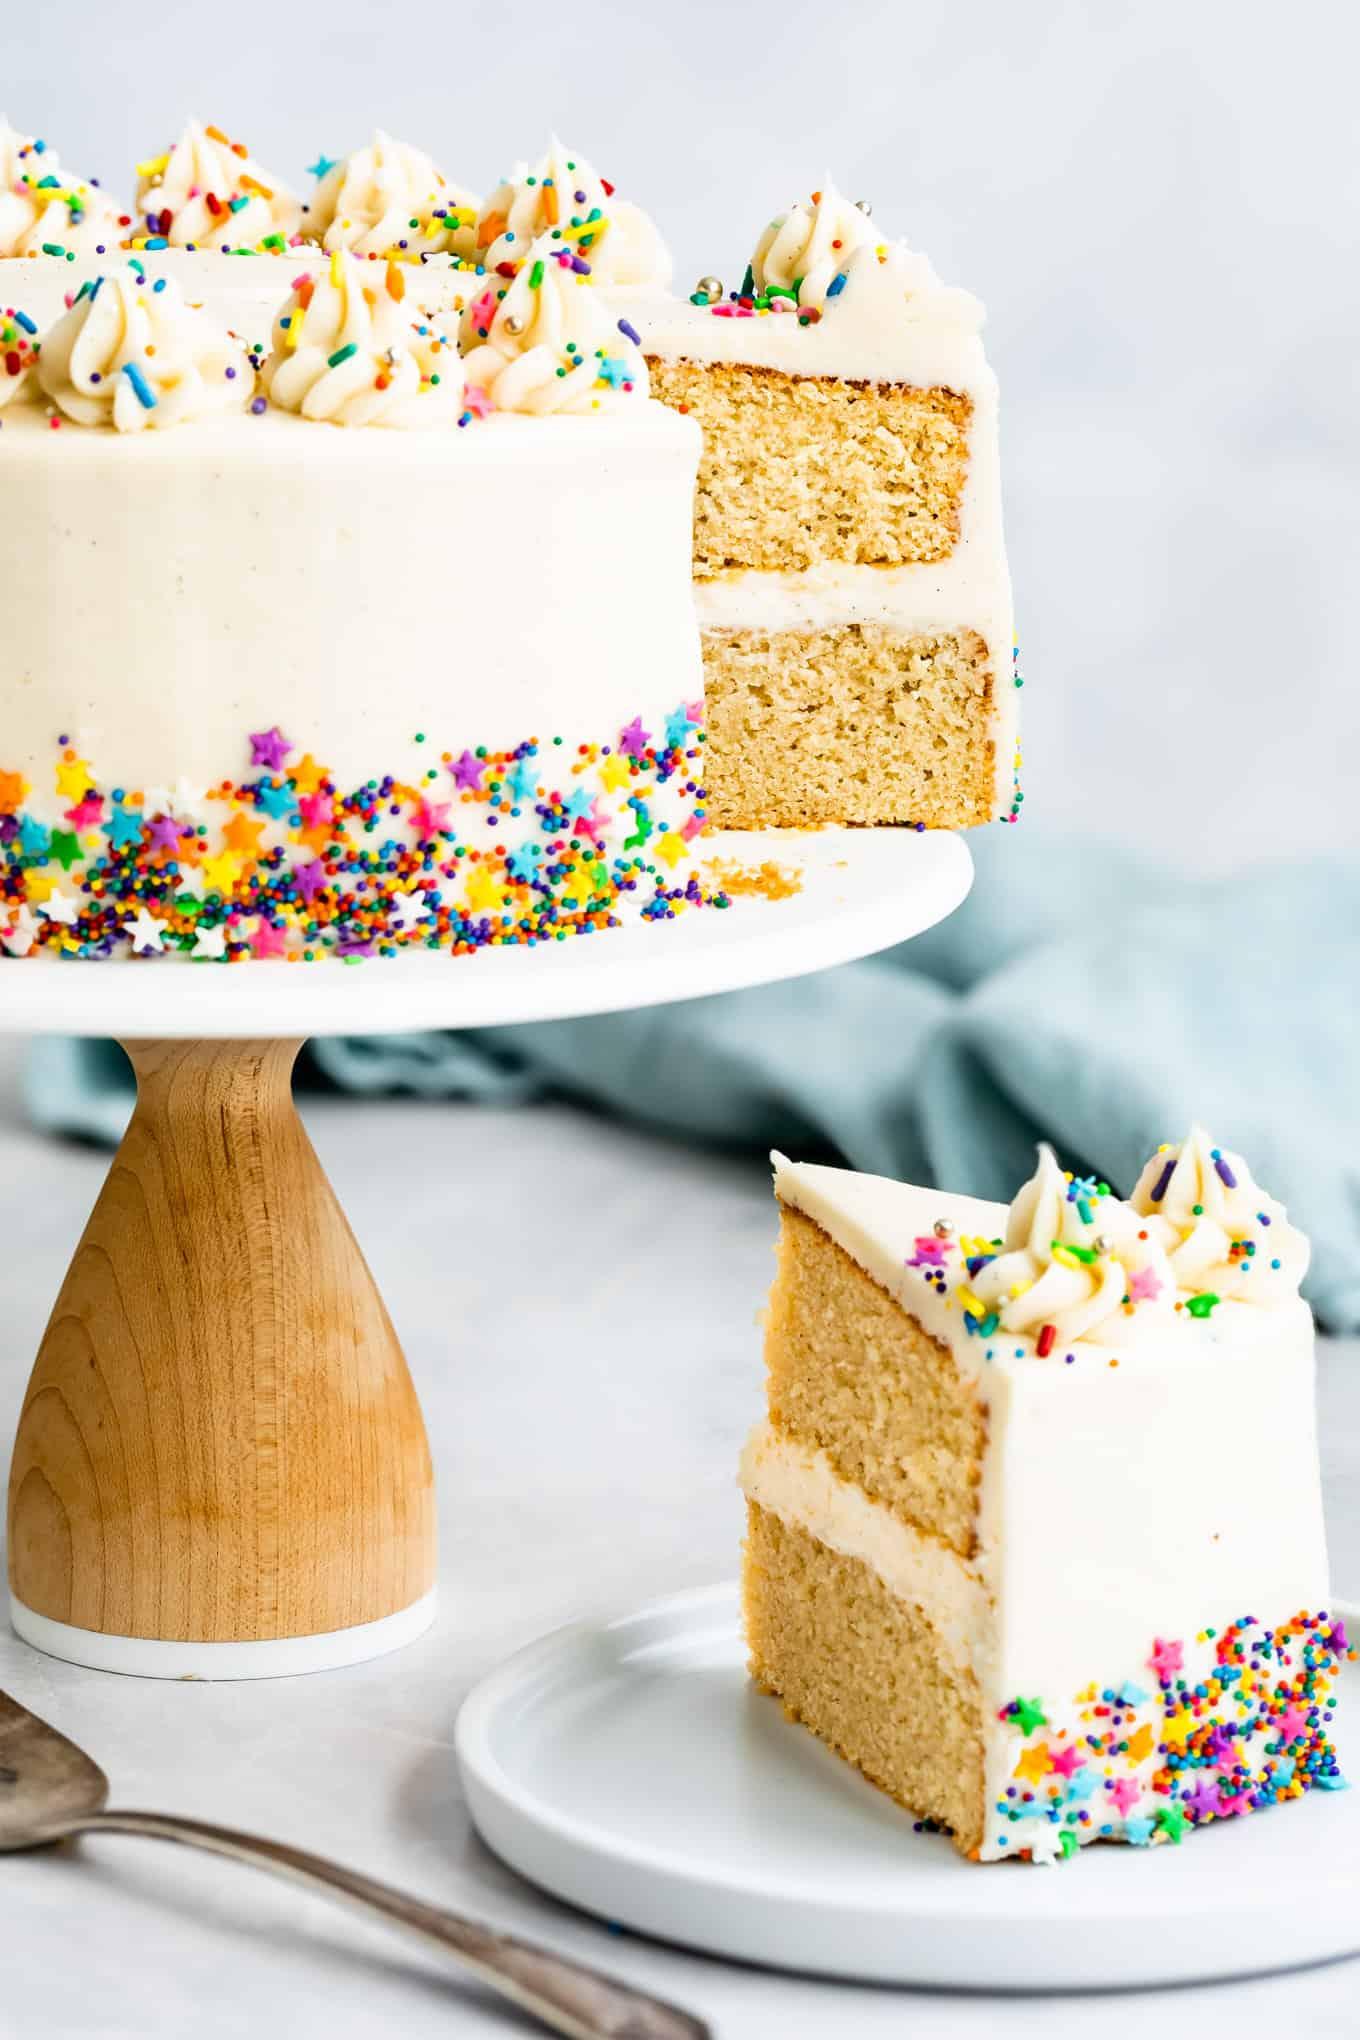 Easy Gluten-Free Vanilla Cake Recipe